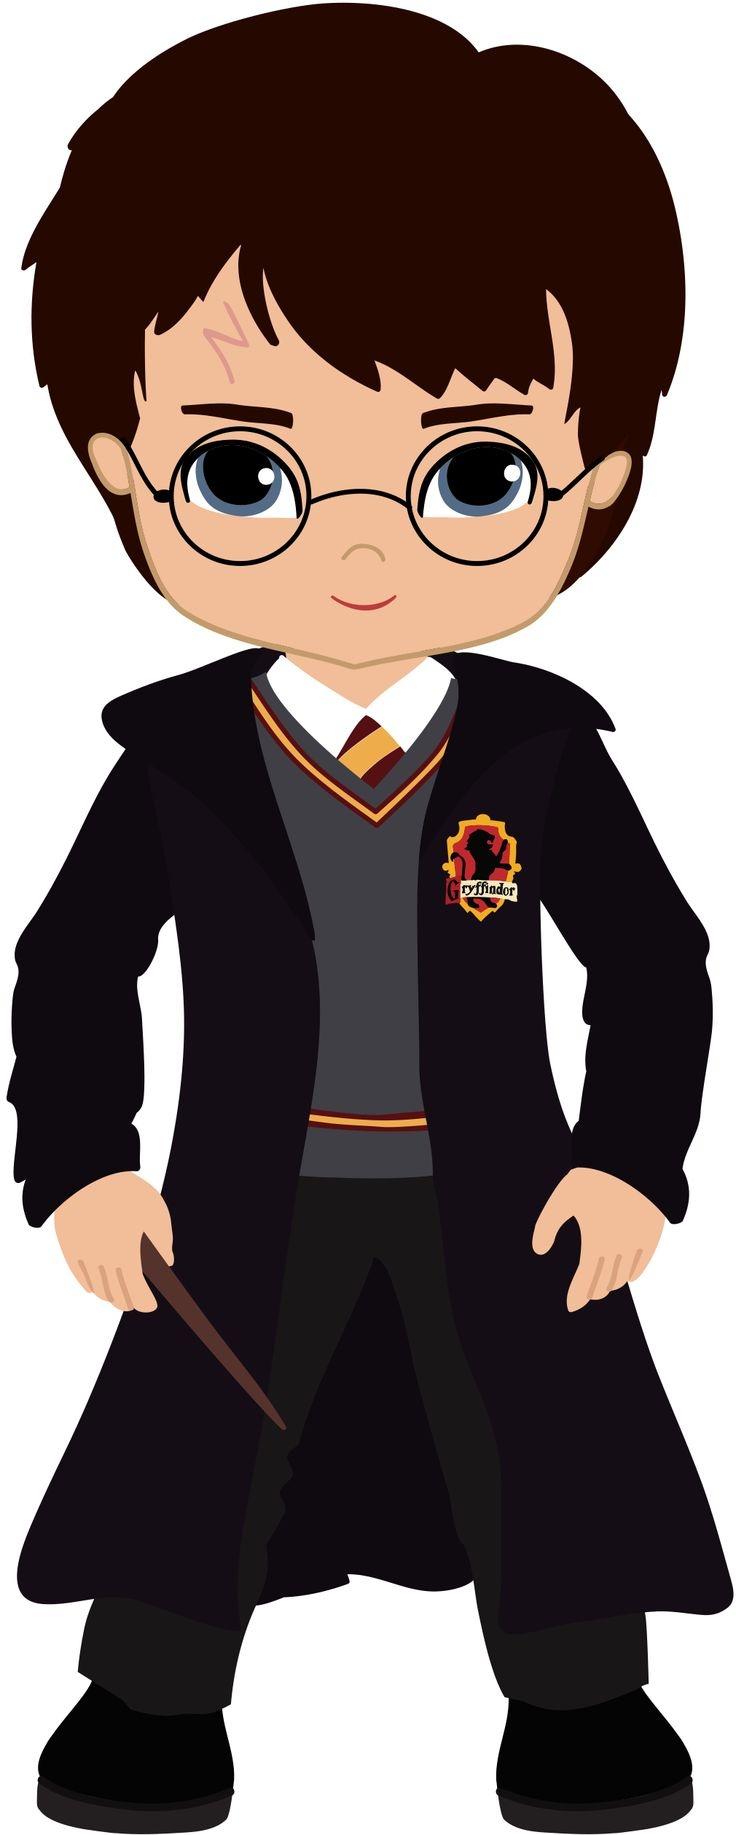 Free Harry Potter Clip Art, Download Free Clip Art, Free Clip Art On - Free Printable Harry Potter Clip Art